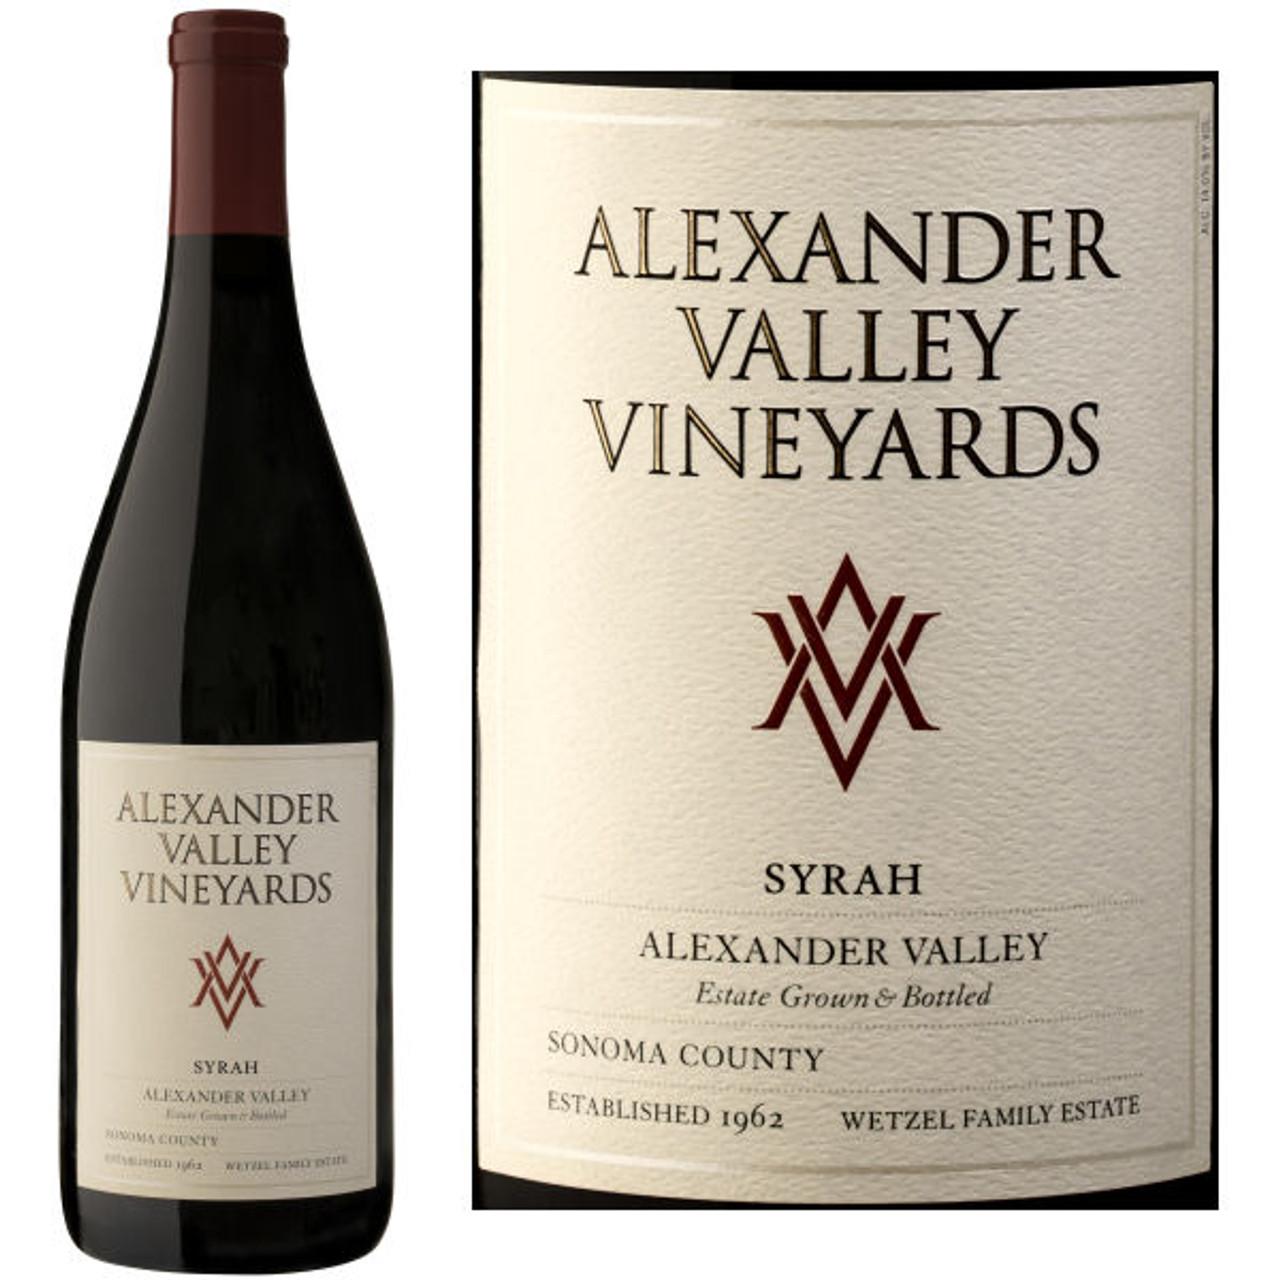 Alexander Valley Vineyards Wetzel Family Estate Syrah